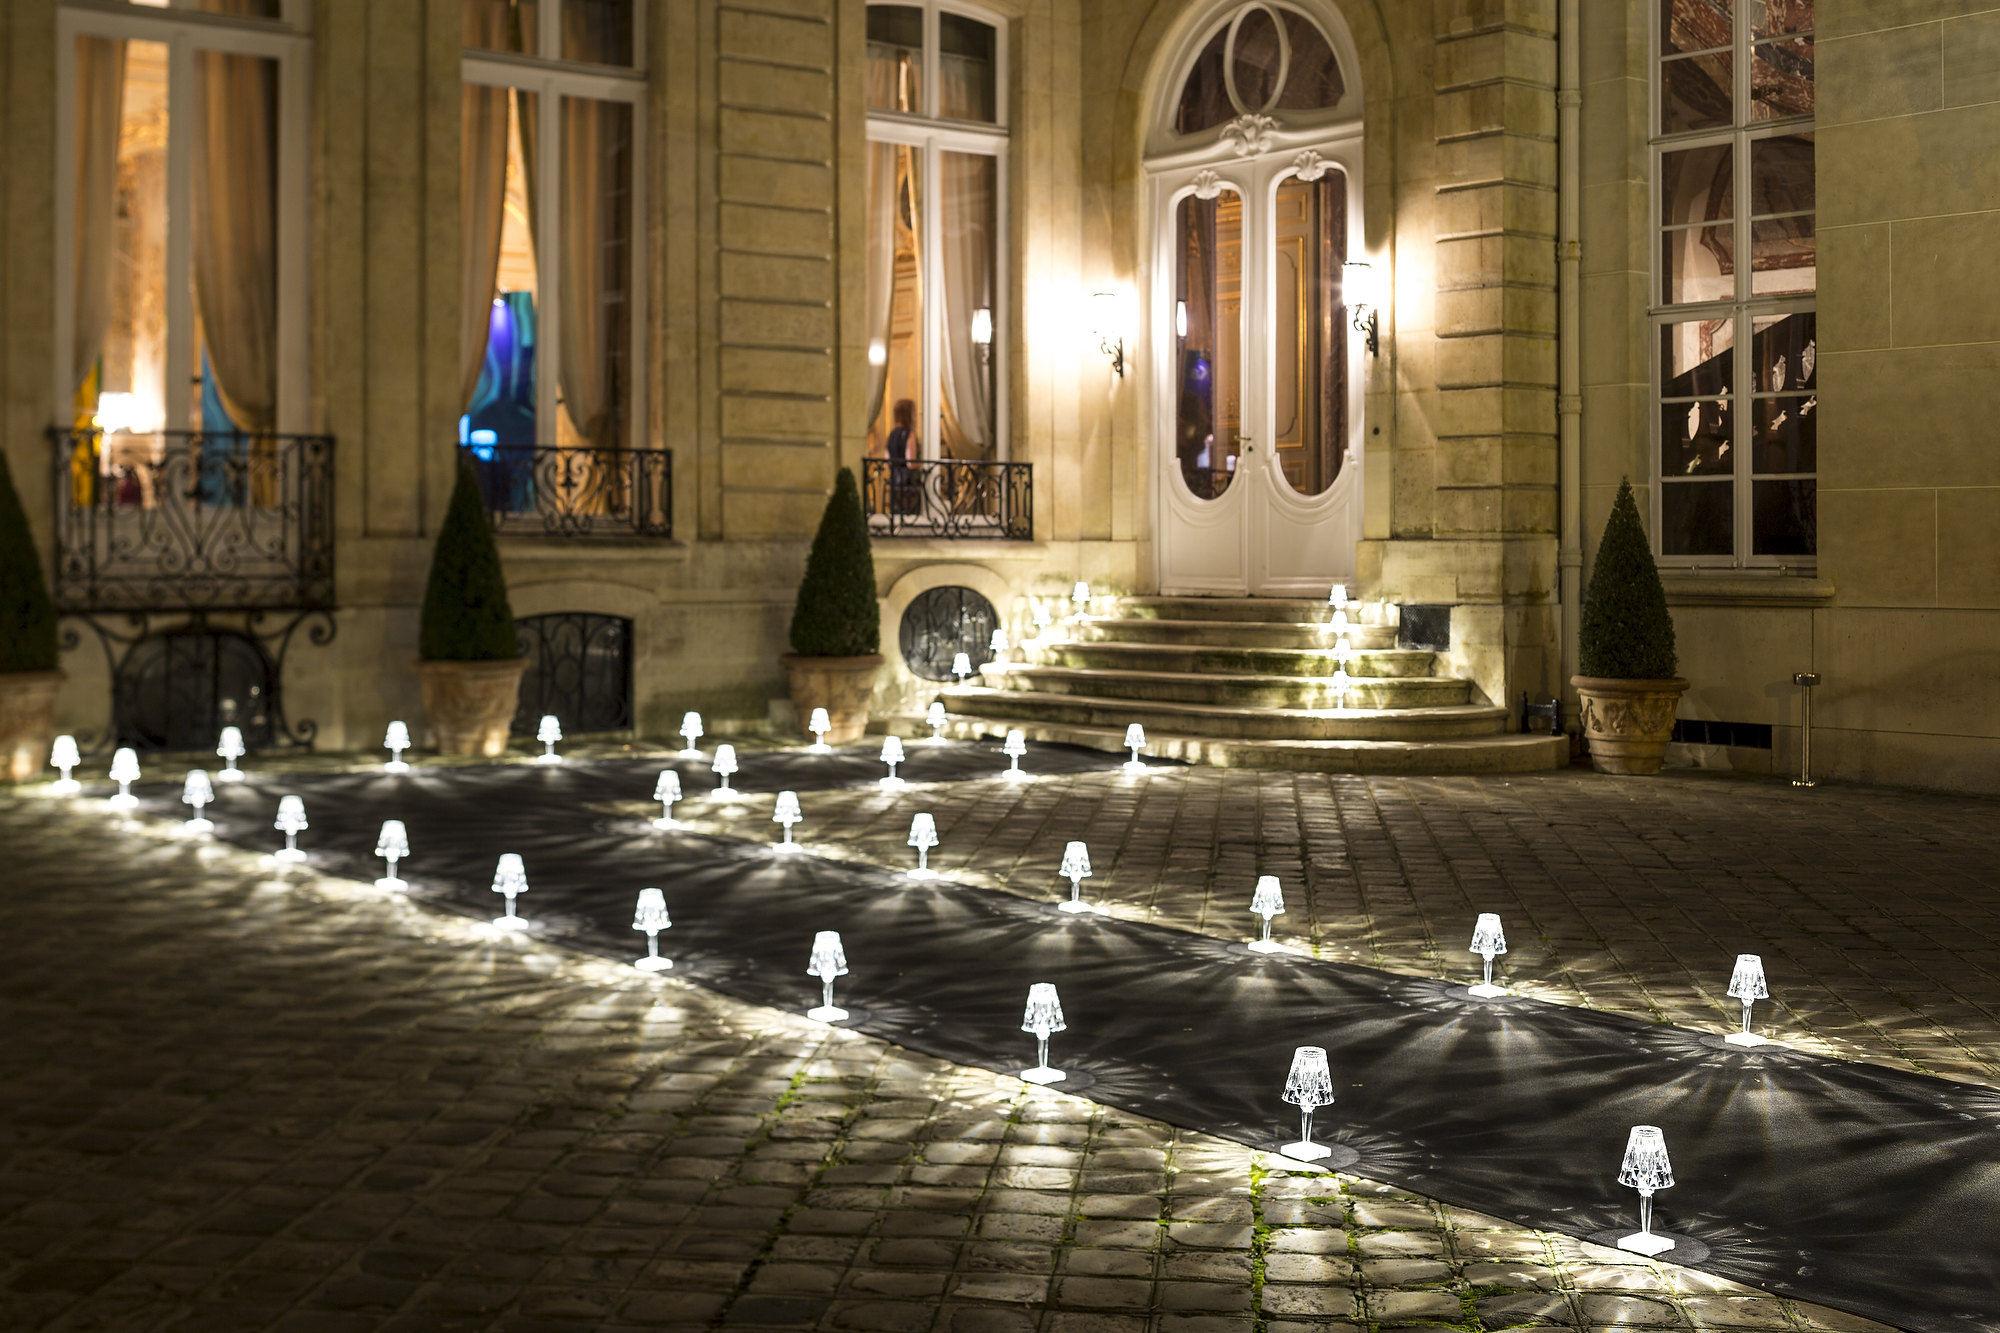 Lampe Ohne Kabel Battery LED Von Kartell - Braun